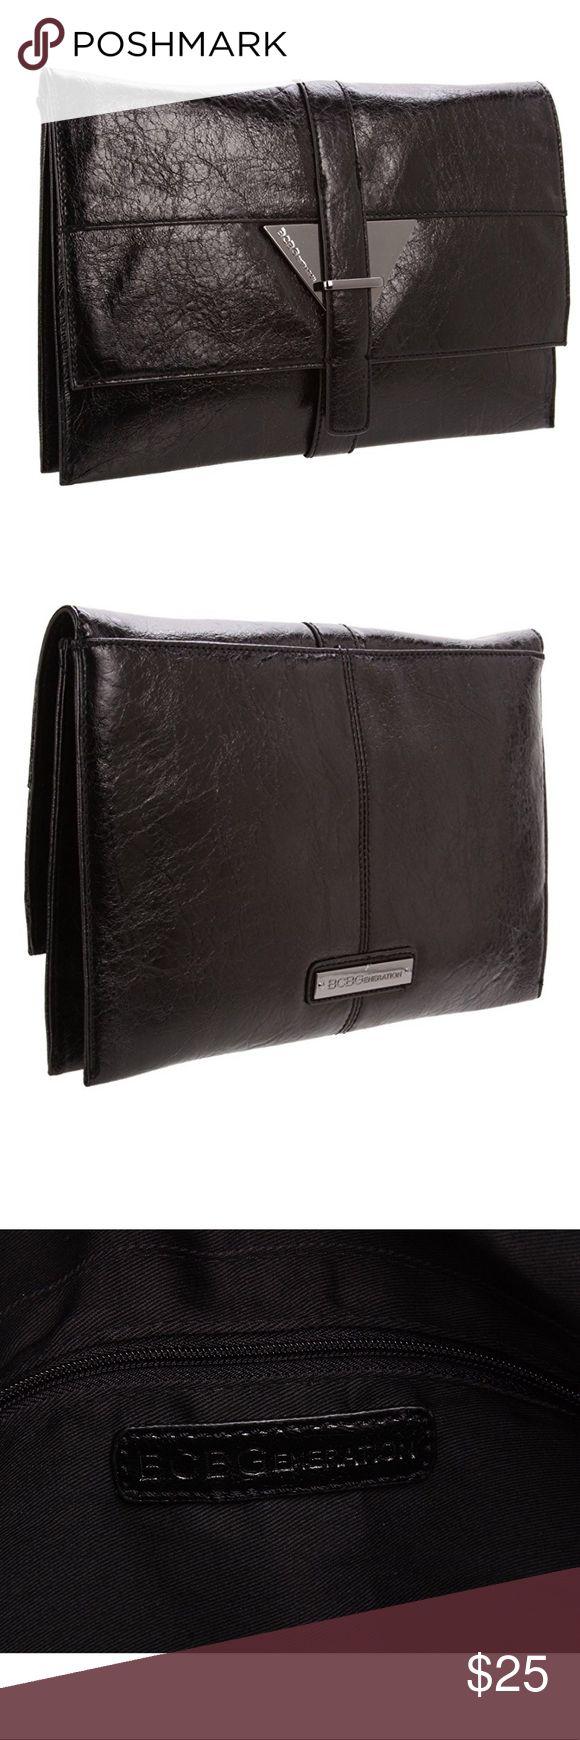 Selling this New BCBGeneration Julia Clutch Black on Poshmark! My username is: bgthrifter. #shopmycloset #poshmark #fashion #shopping #style #forsale #BCBGeneration #Handbags